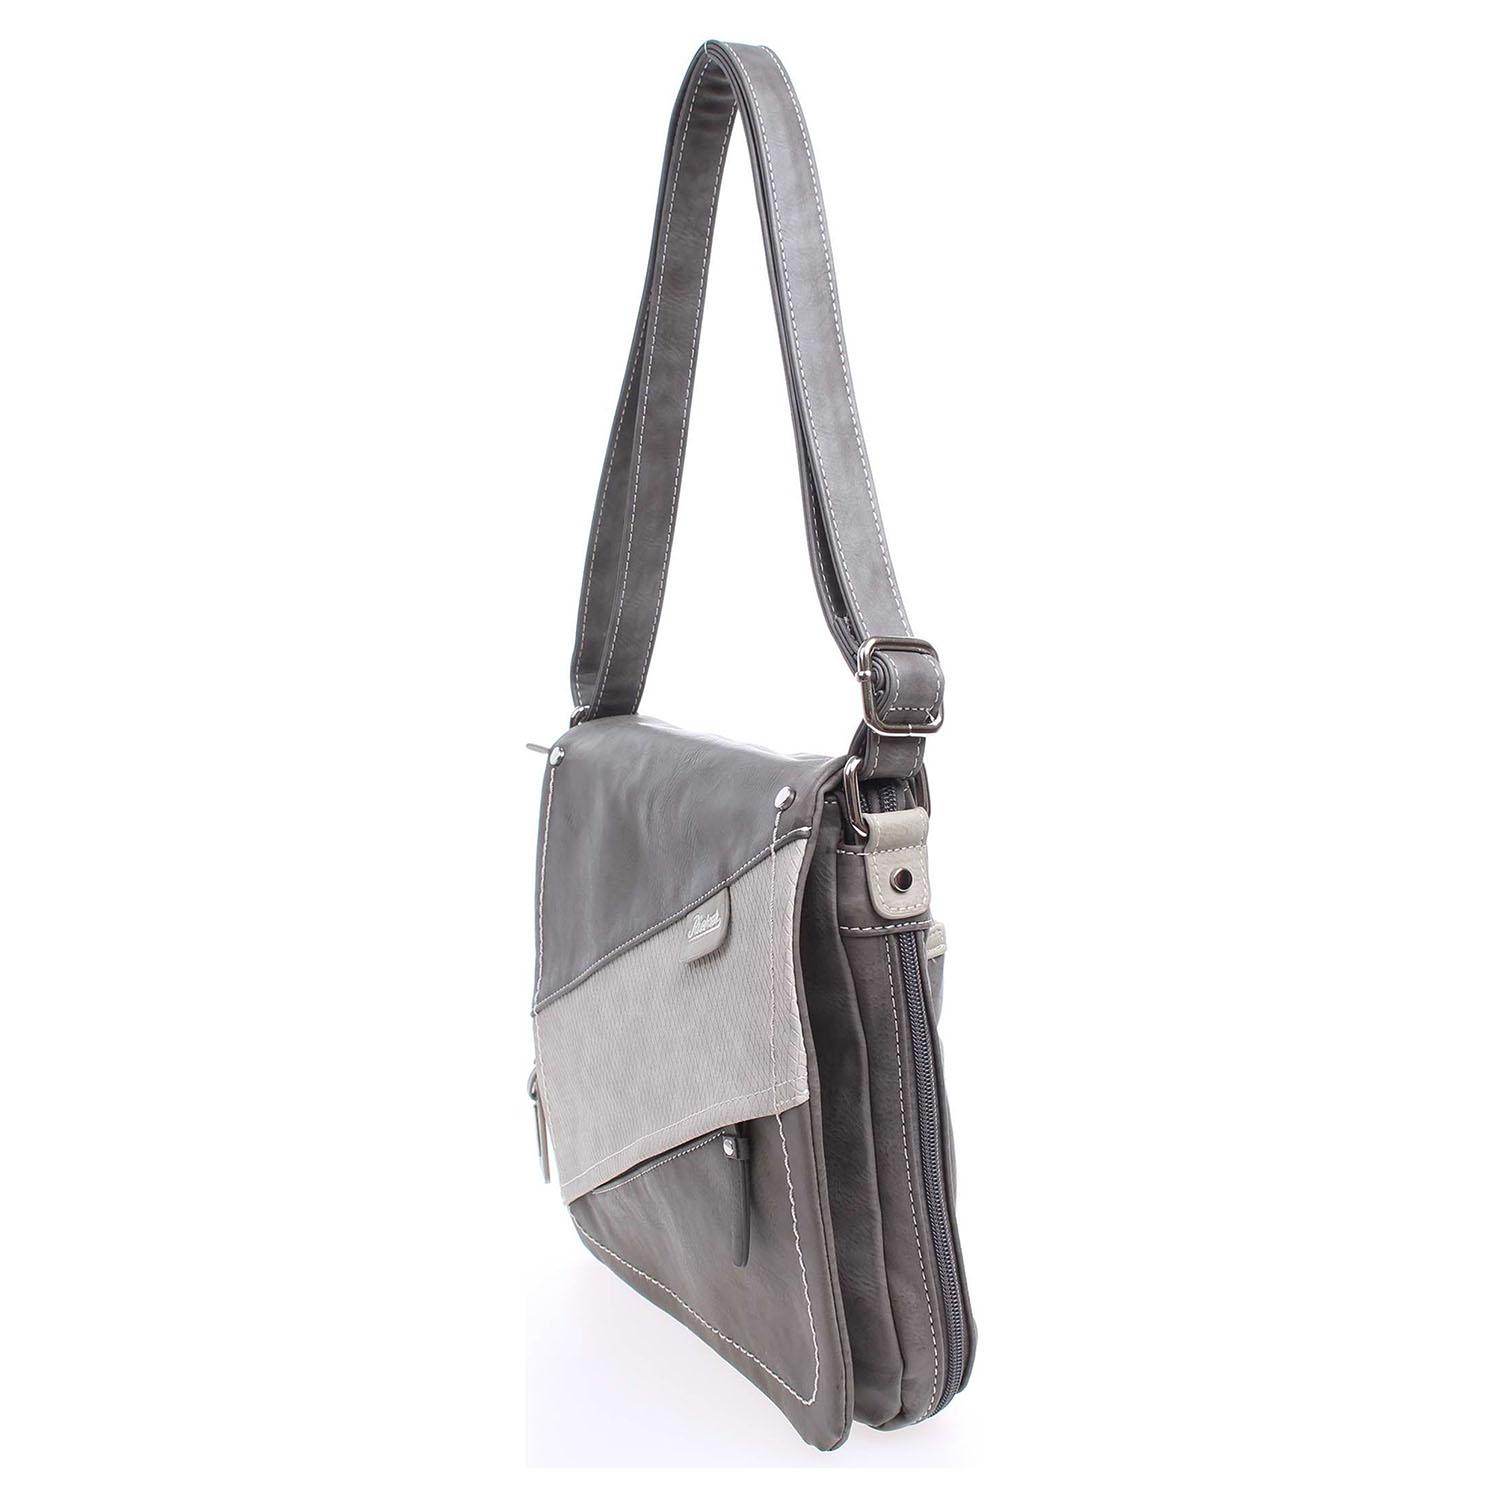 Ecco Rieker dámská kabelka H1102-45 šedá 11890908